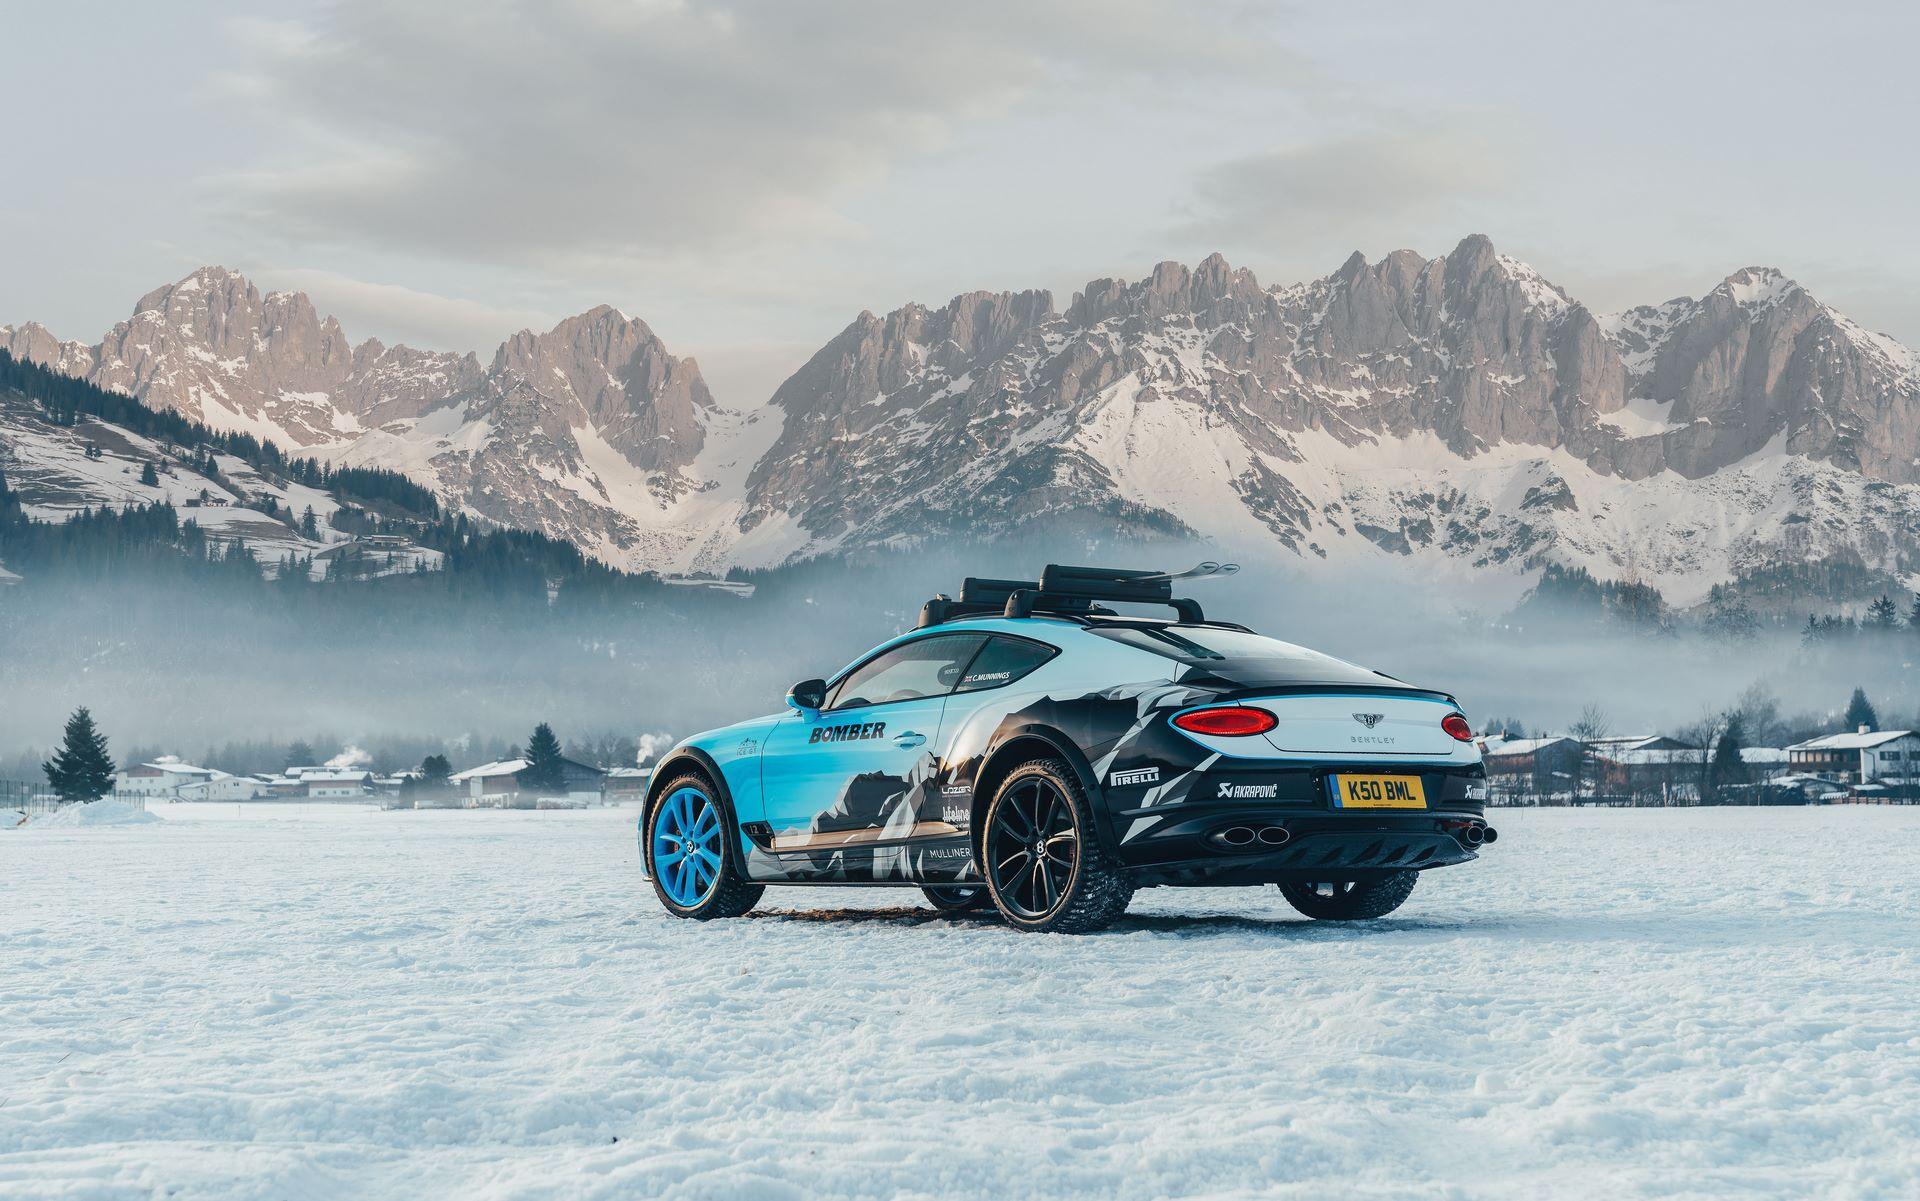 Bentley-Continental-GT-Ice-Race-2020-2